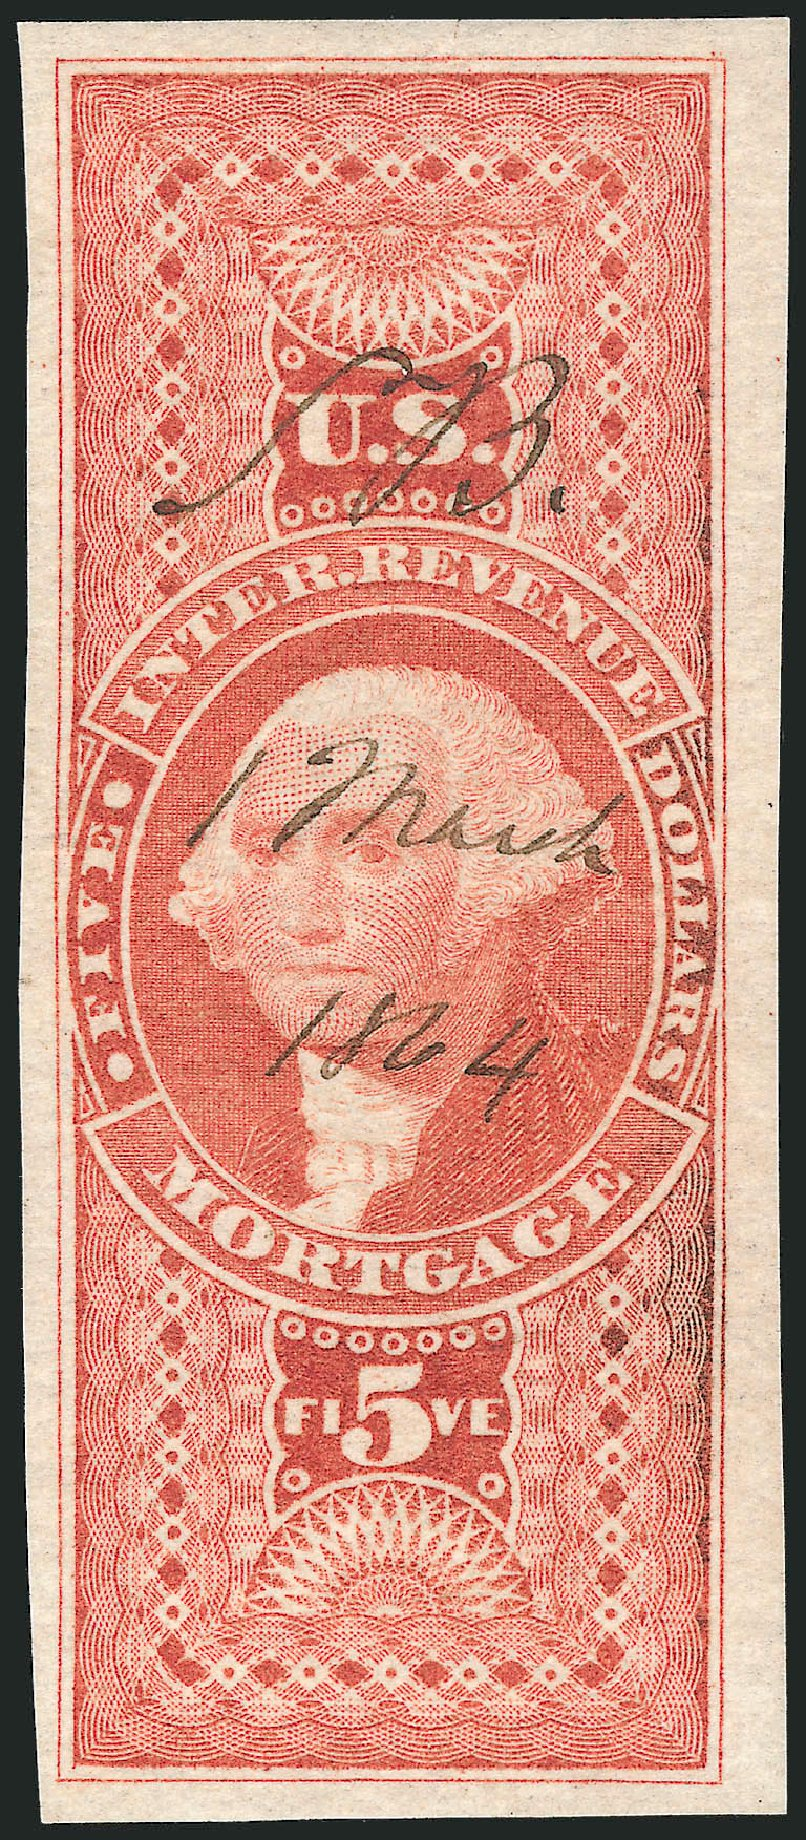 US Stamps Prices Scott Catalog #R91 - 1862 US$5.00 Revenue Mortgage. Robert Siegel Auction Galleries, Nov 2011, Sale 1015, Lot 28